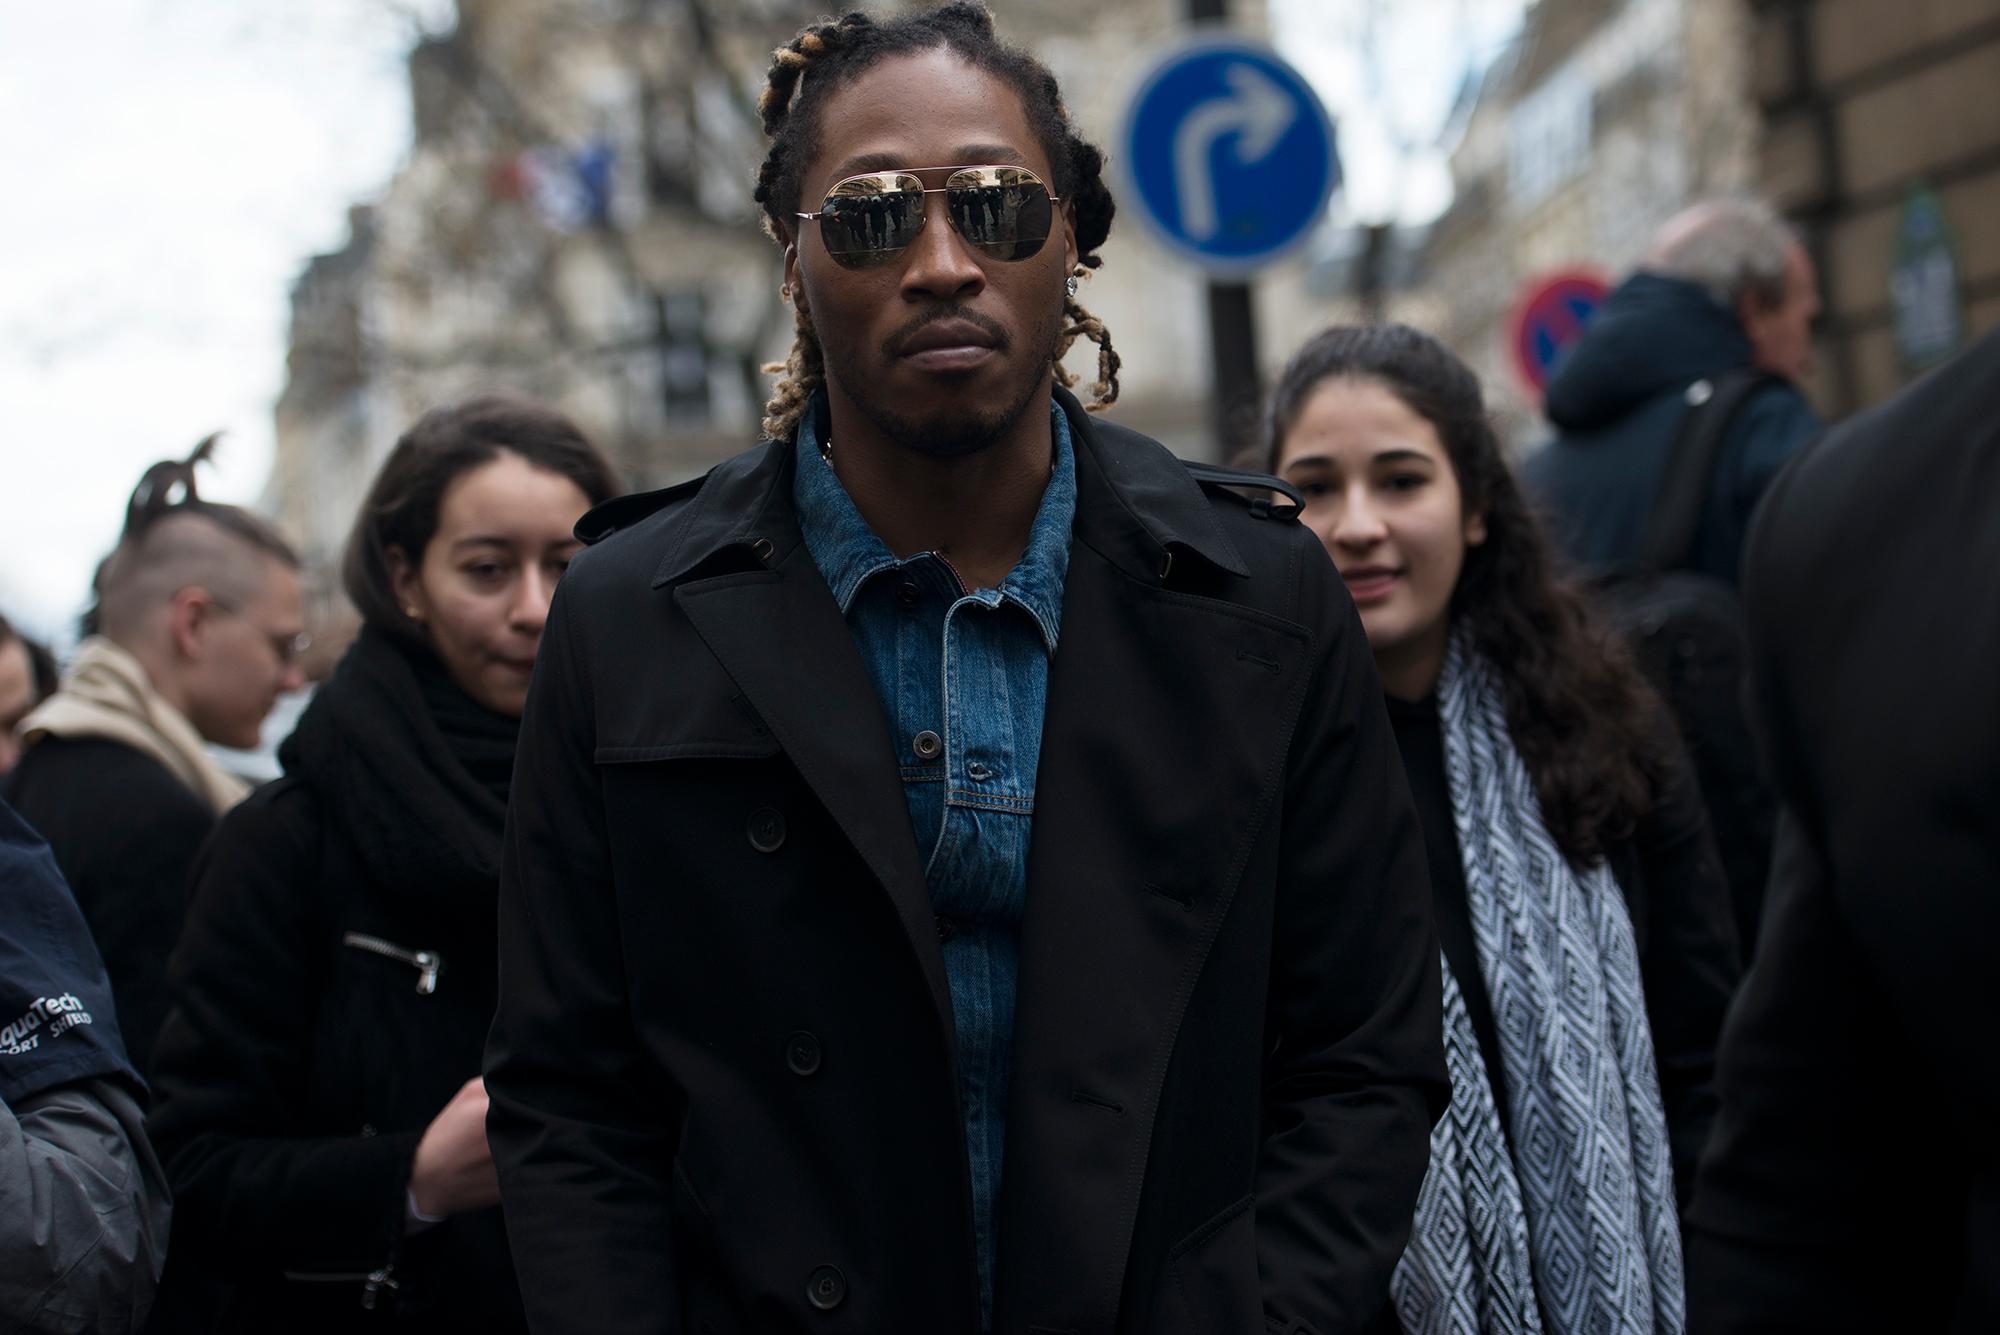 Streetsnaps Paris Fashion Week March 2017 Part 2 - 3747936